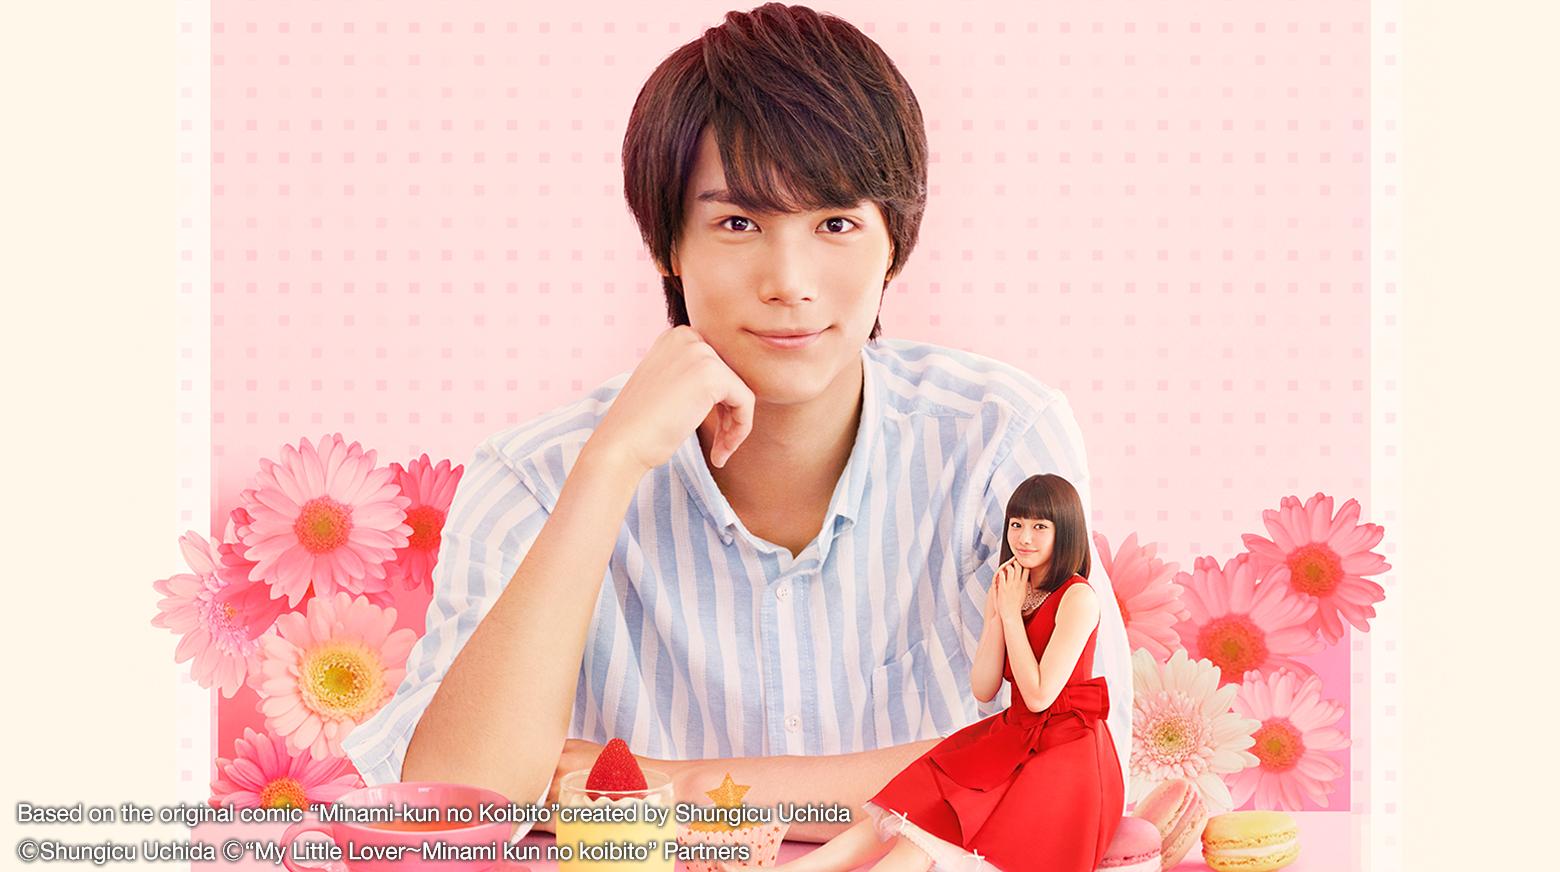 My Little Lover - Minami Kun No Koibito